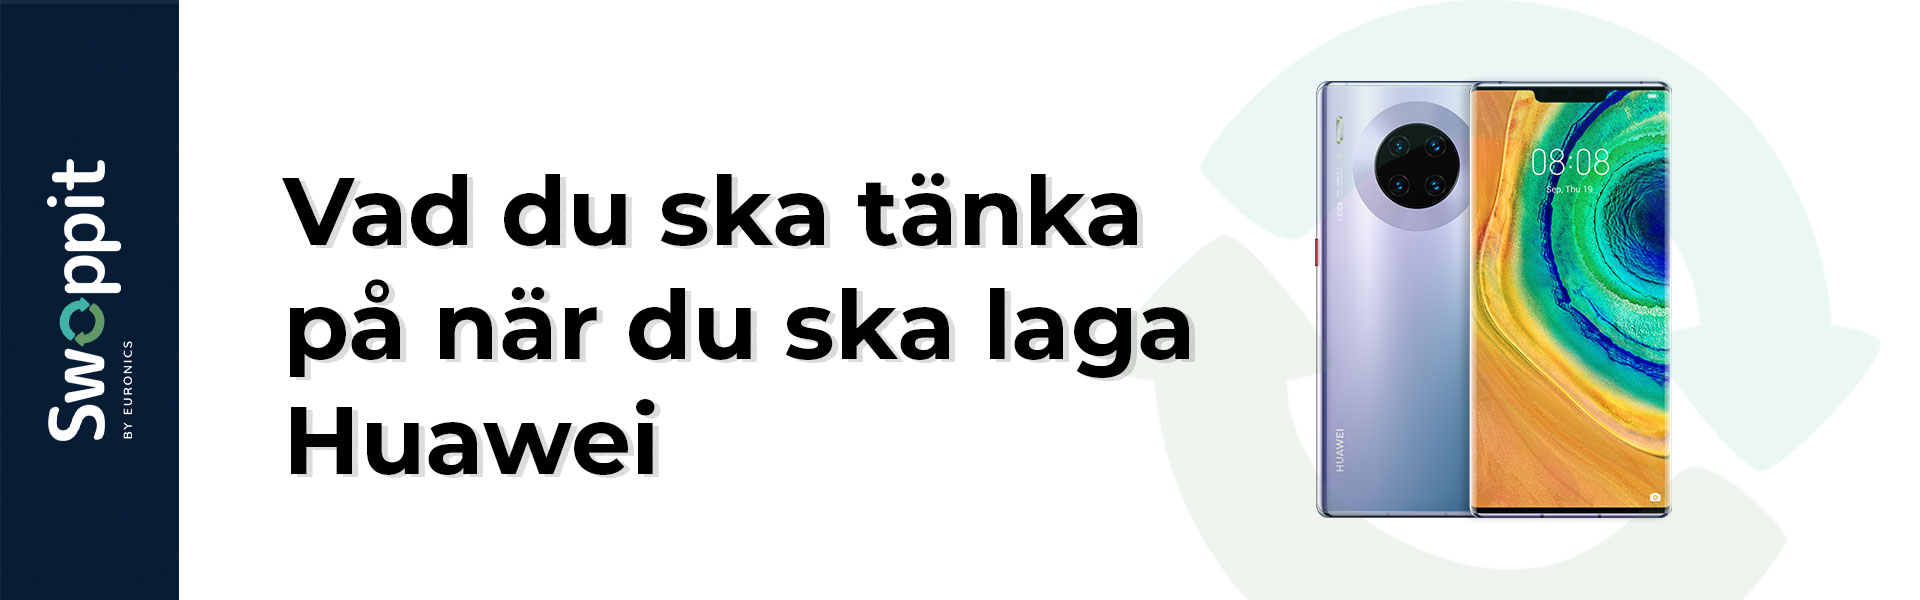 laga-huawei-mobil